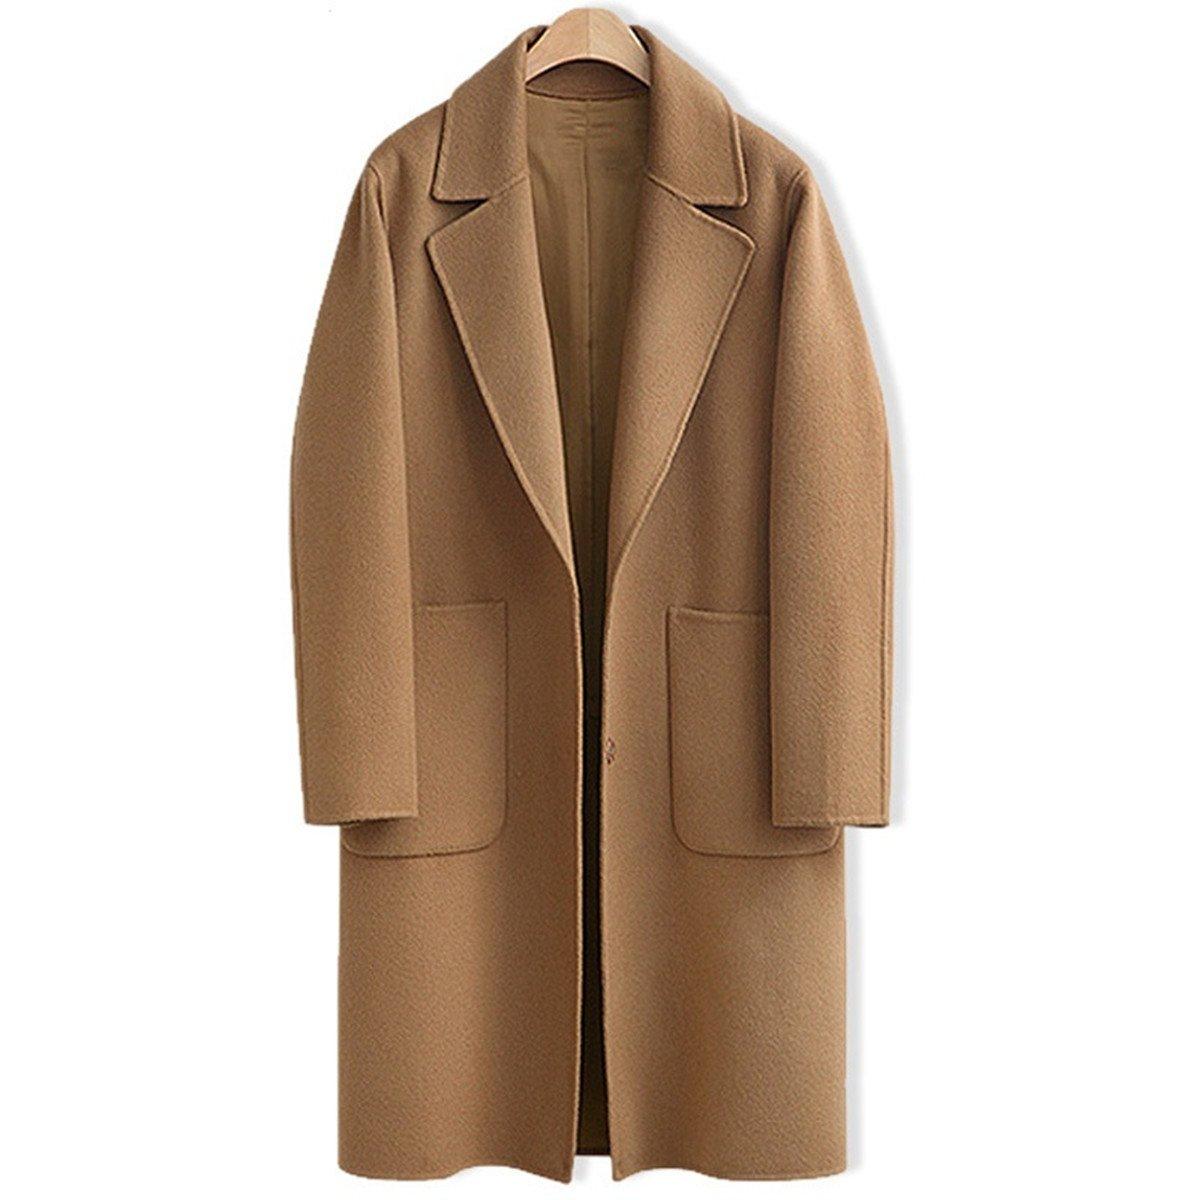 AOMEI Long Oversize Wool Coats for Women Winter Button Closure Camel Color Outwear Size XL